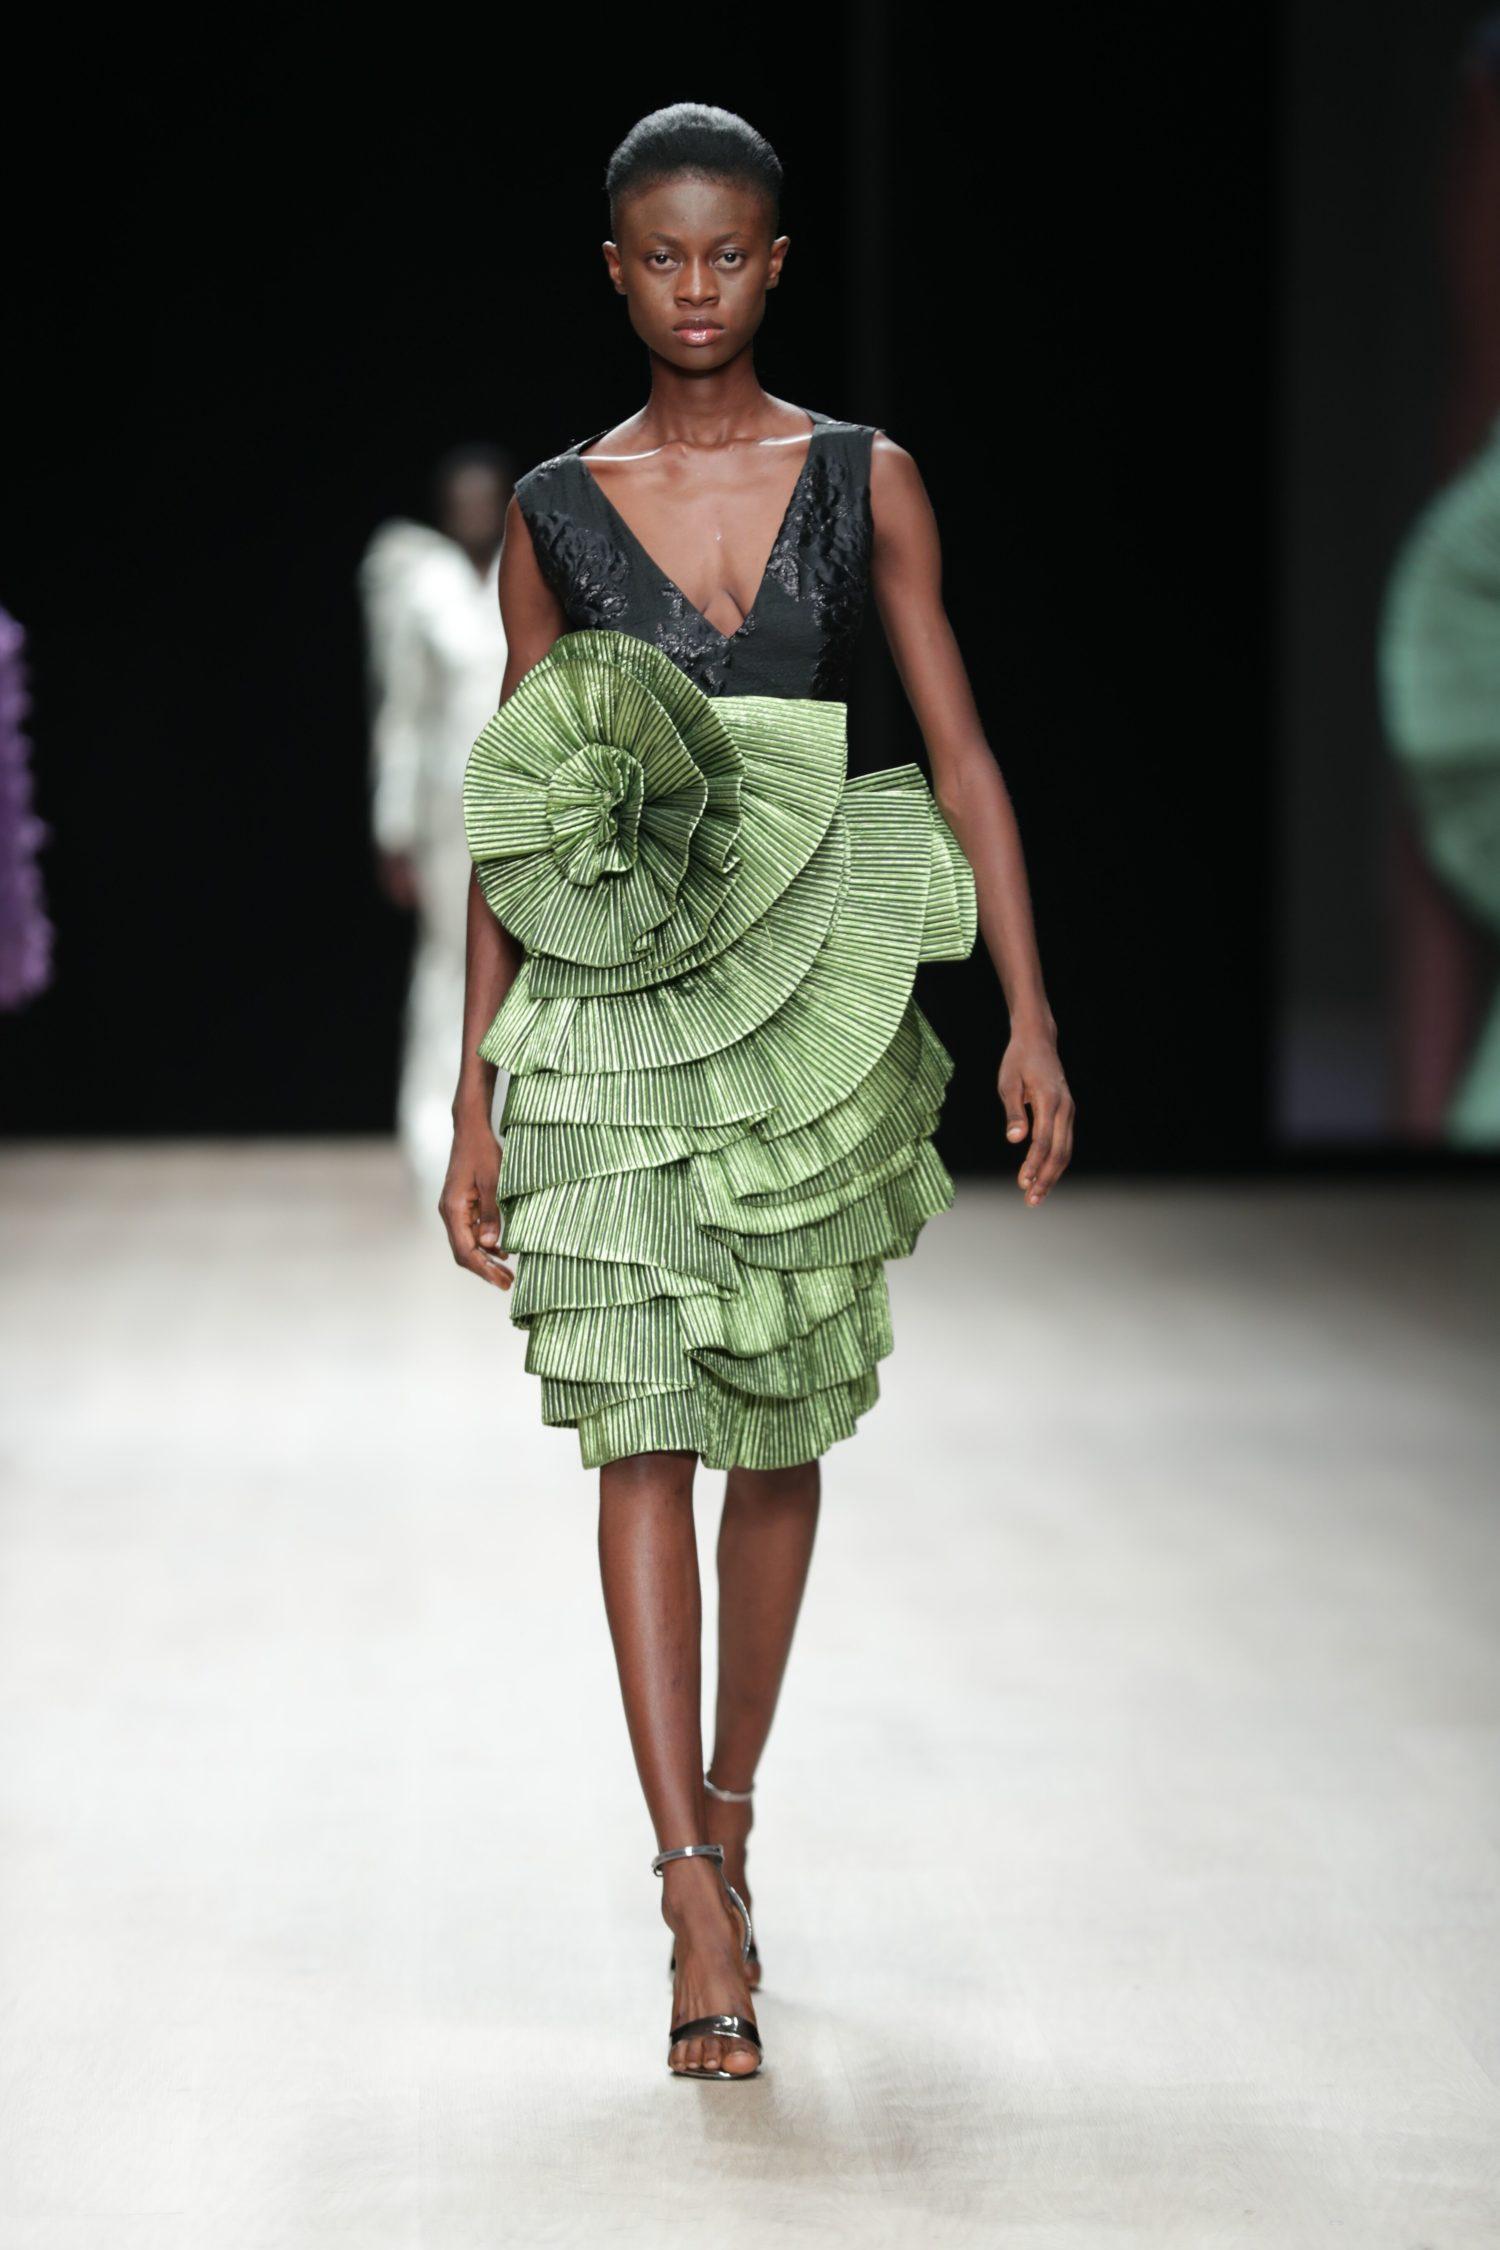 ARISE Fashion Week 2019 | Yutee Rone